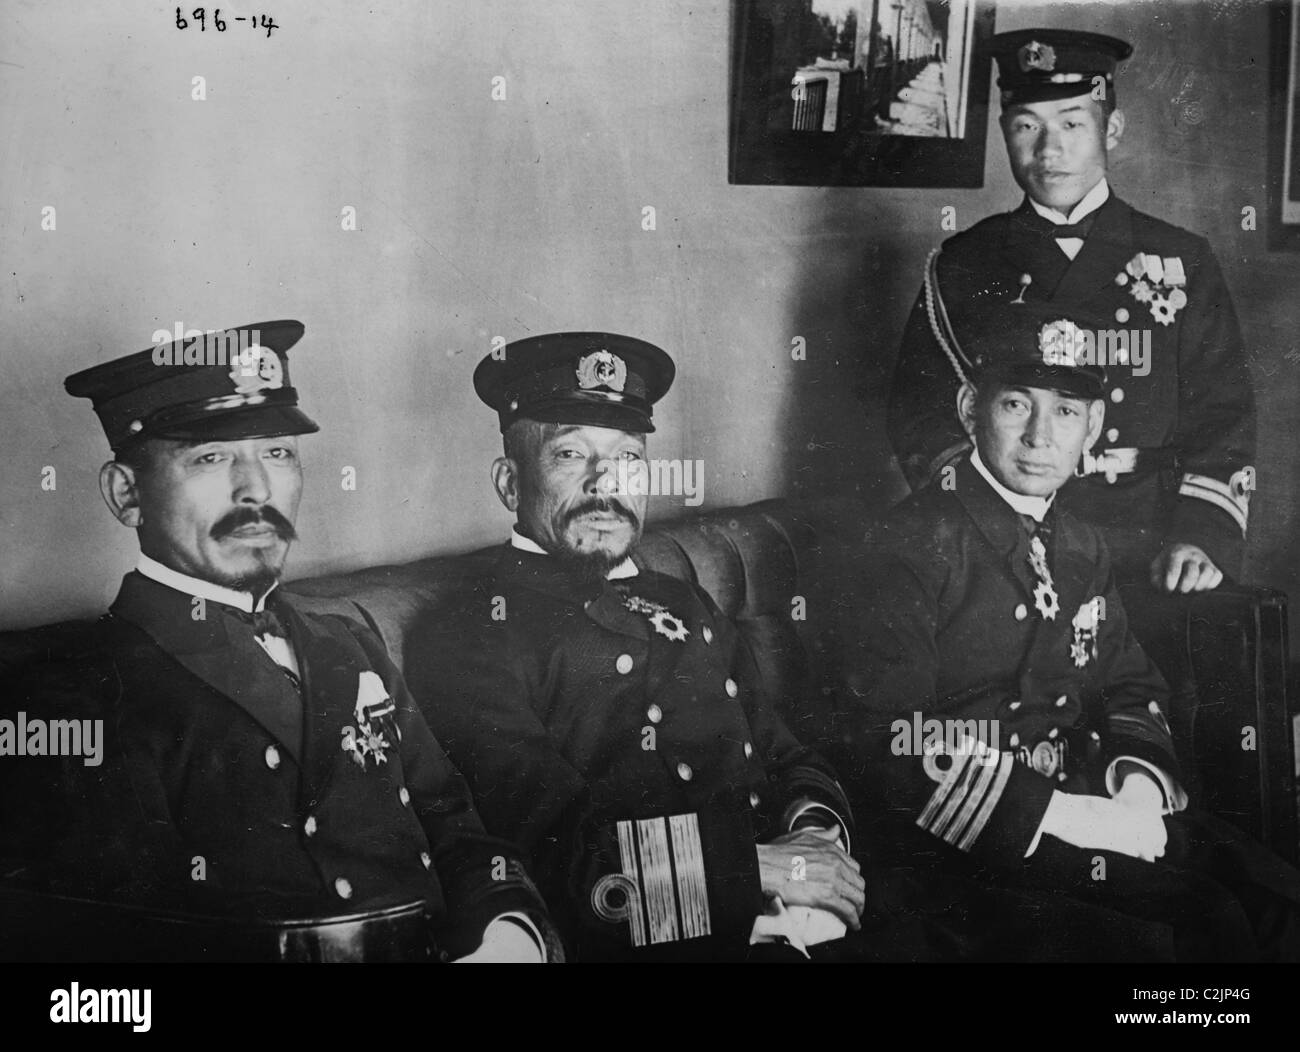 Japanese Naval officers: Capt. G. Ishii, Adm. Ijichi, Flag Lieut. Shimomure, and Capt. T. Sato - Stock Image